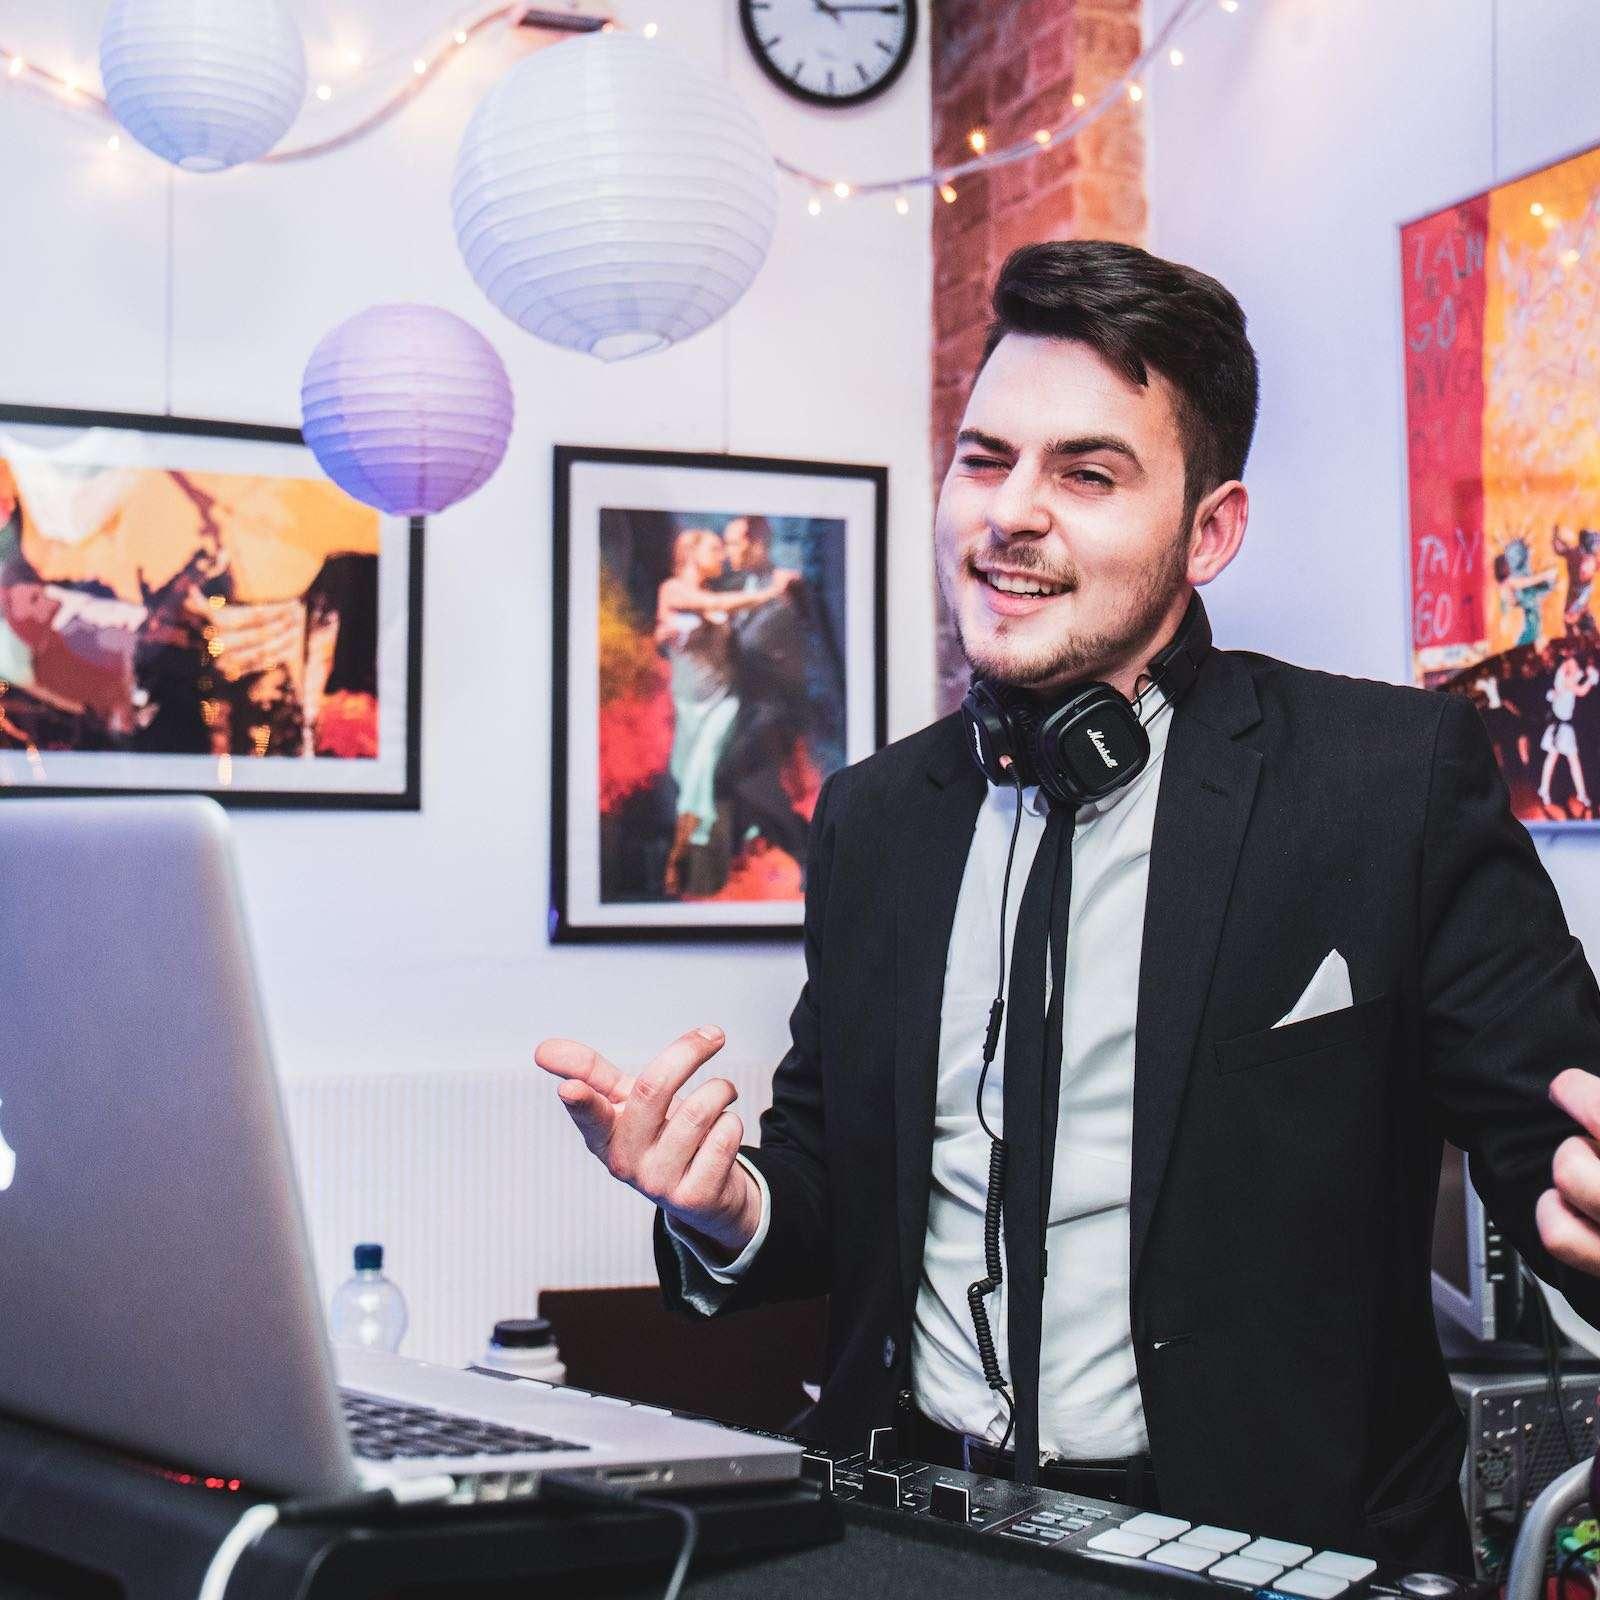 DJ | Hannover | Buchen | Discjockey | Marvin | Feike | DJ | Firmenfeier | DJ | Messe | Event | DJ | Geburtstag | DJ | Service | DJ | Kosten | DJ | Mieten | DJ | Anfragen | DJ | Agentur | Lehmann | Eventservice